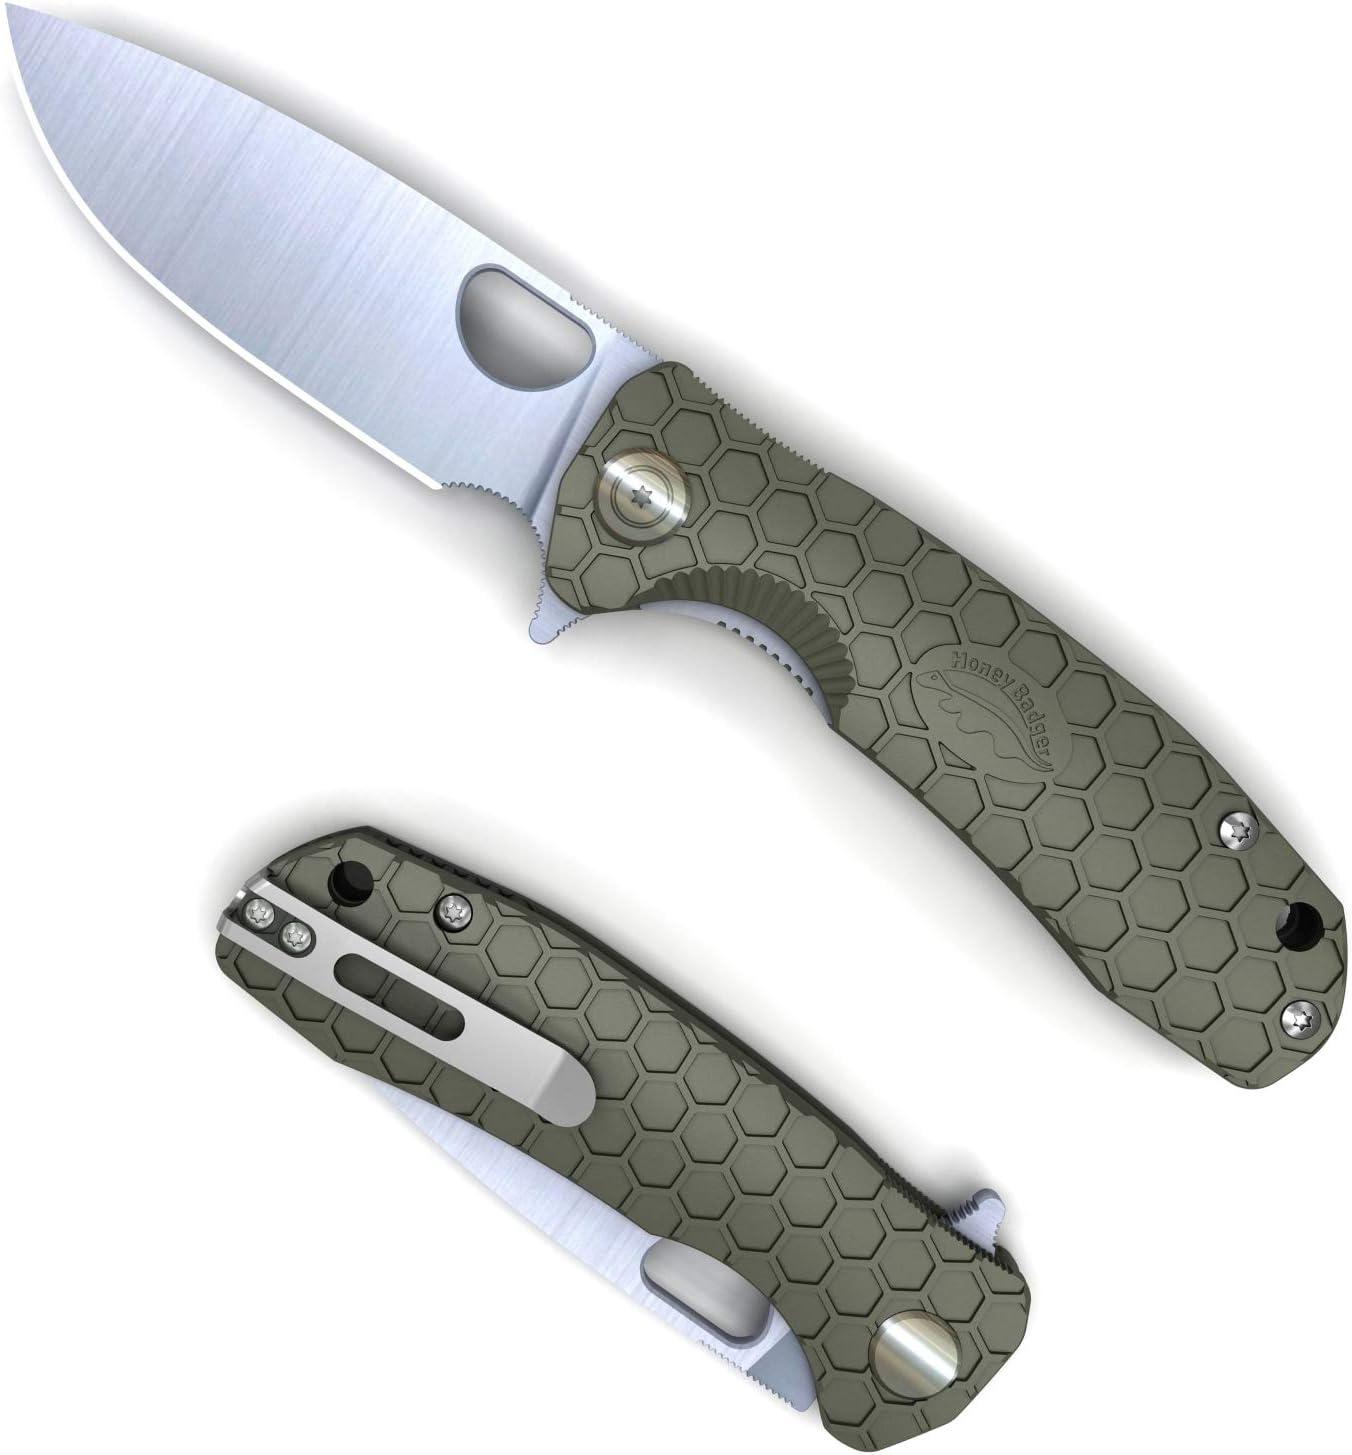 Western Louisville-Jefferson County Mall Active Honey Badger Pocket Regular dealer Folding Point EDC Drop Knife